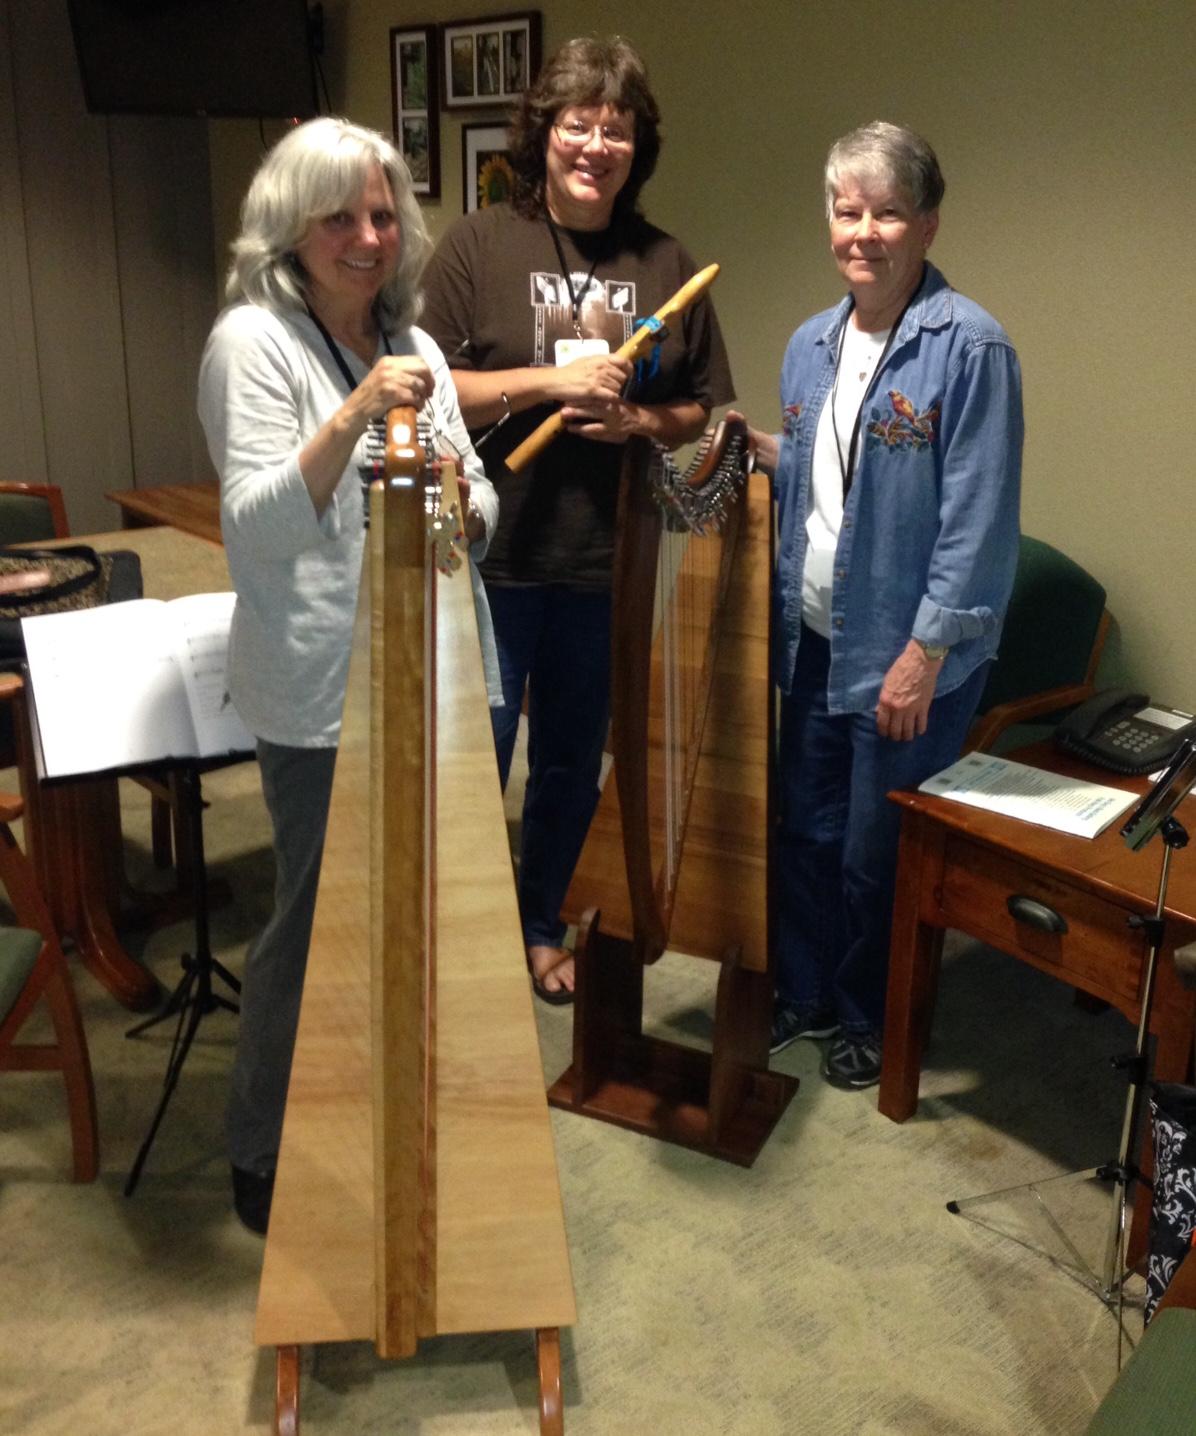 Judy with 2 harps